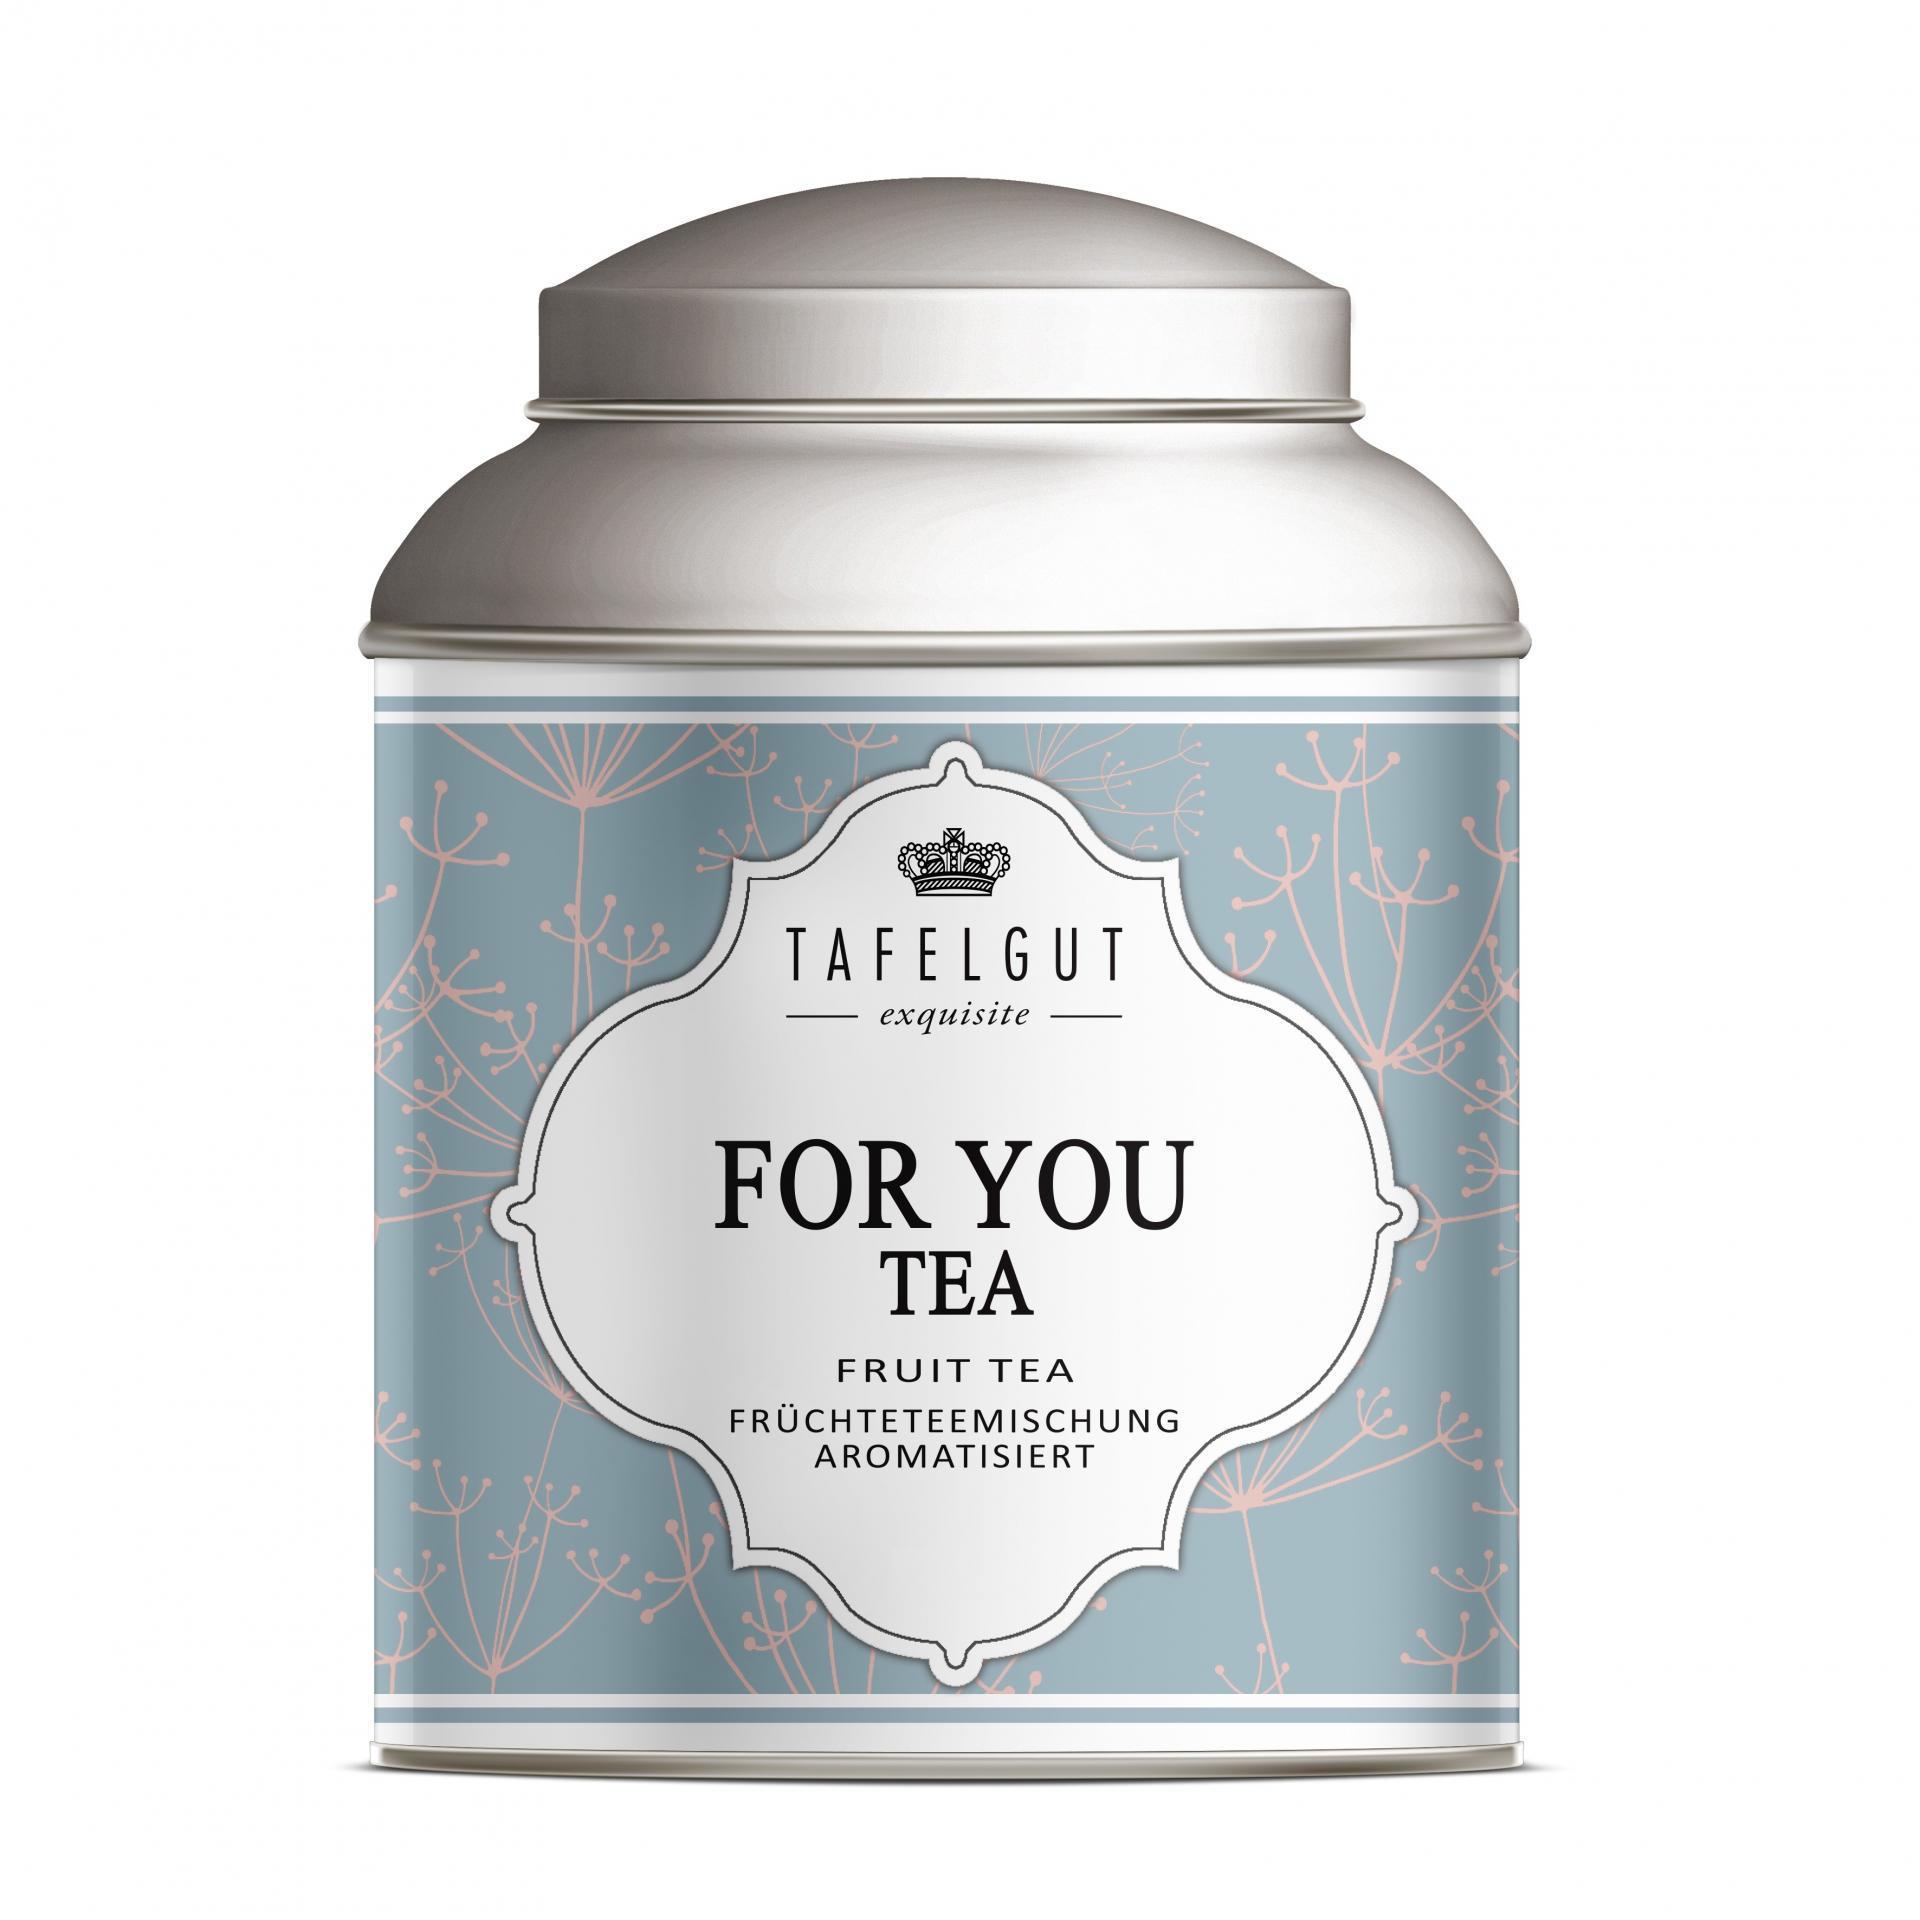 TAFELGUT Mini ovocný čaj For You Tea - 35gr, modrá barva, kov